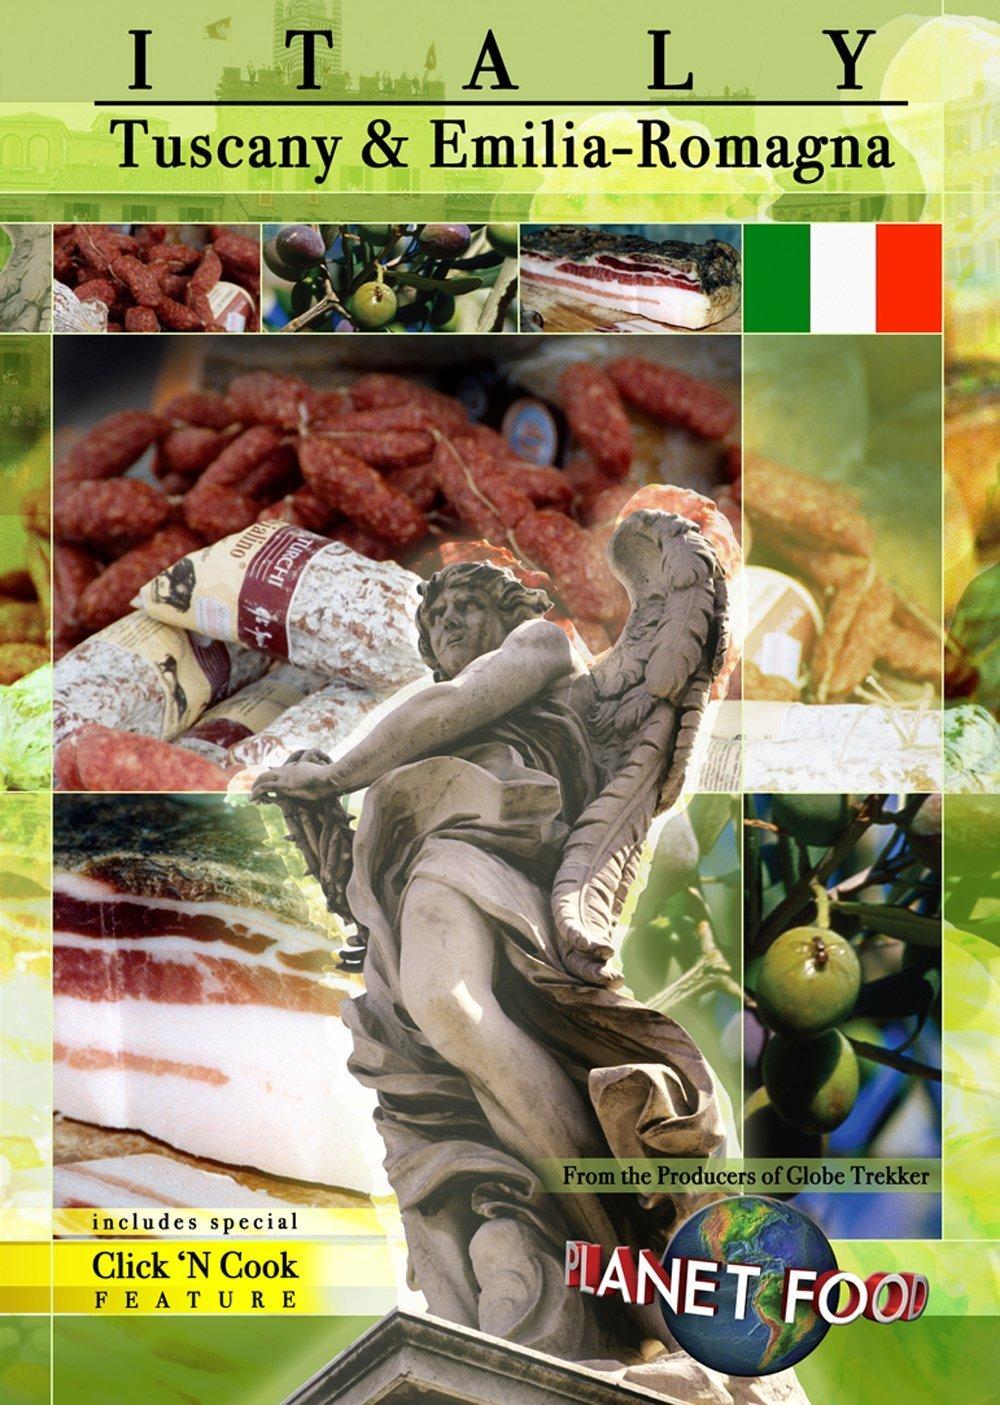 Globe Trekker: Planet Food - Italy - Tuscany & Emilia Romagna